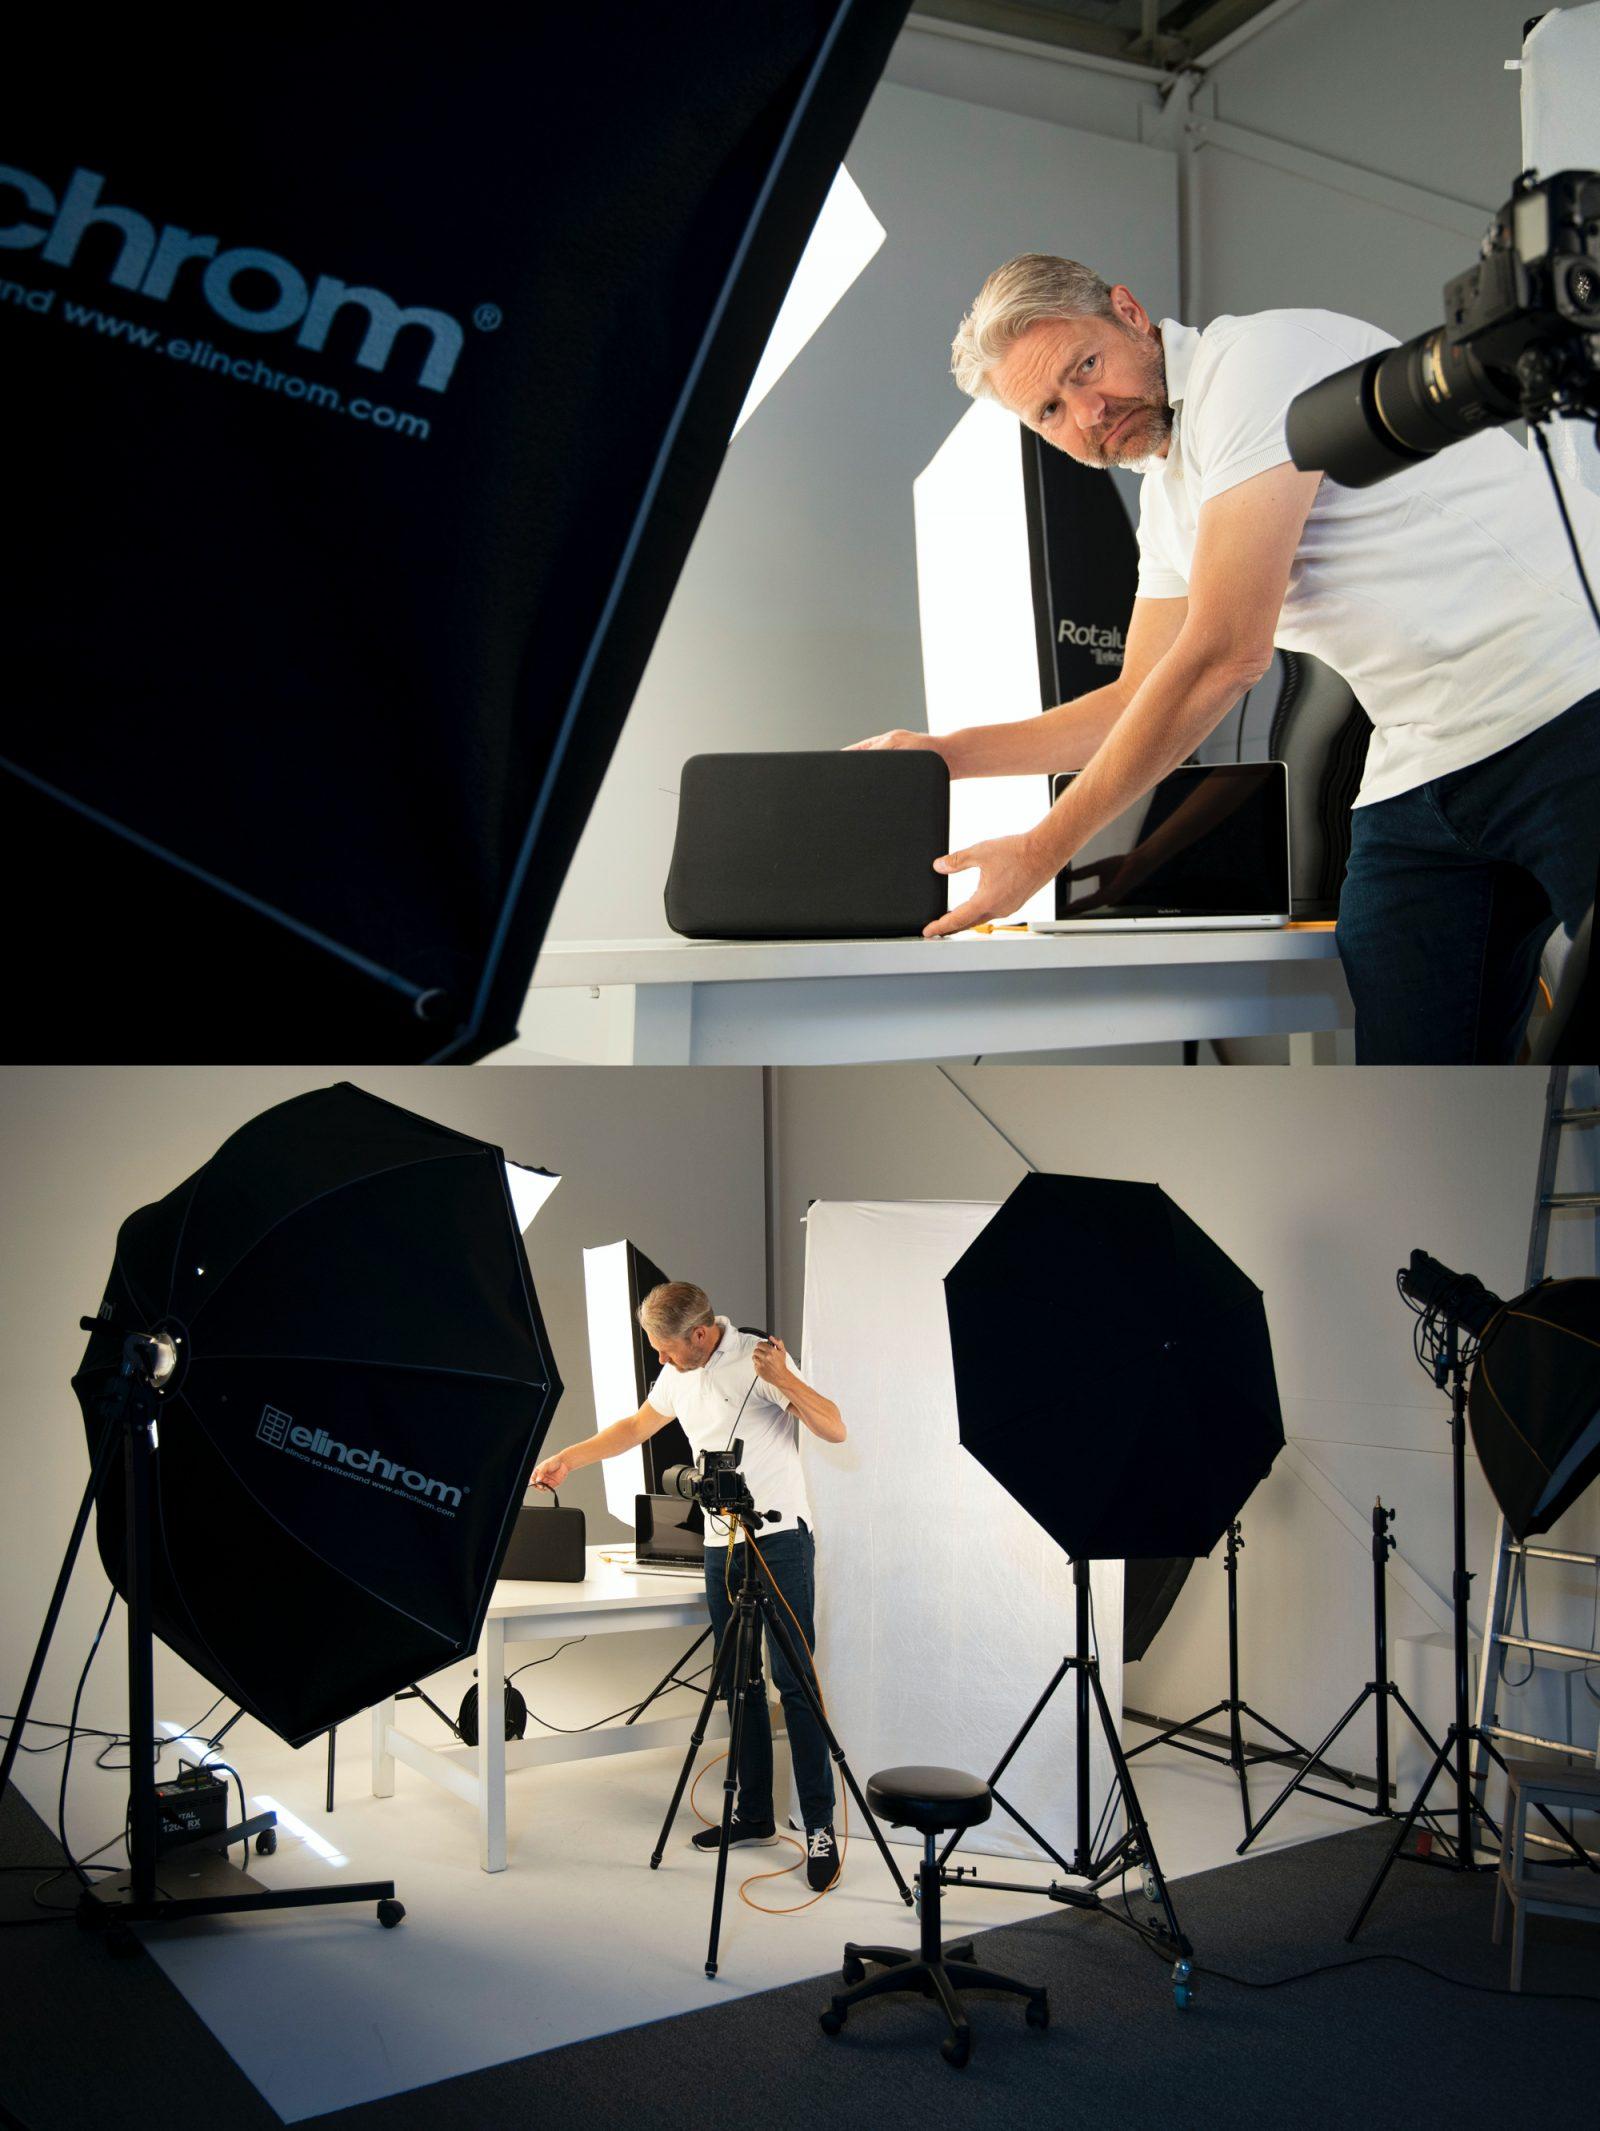 fotostudio-rotterdam-portretfotograaf-productfotograaf